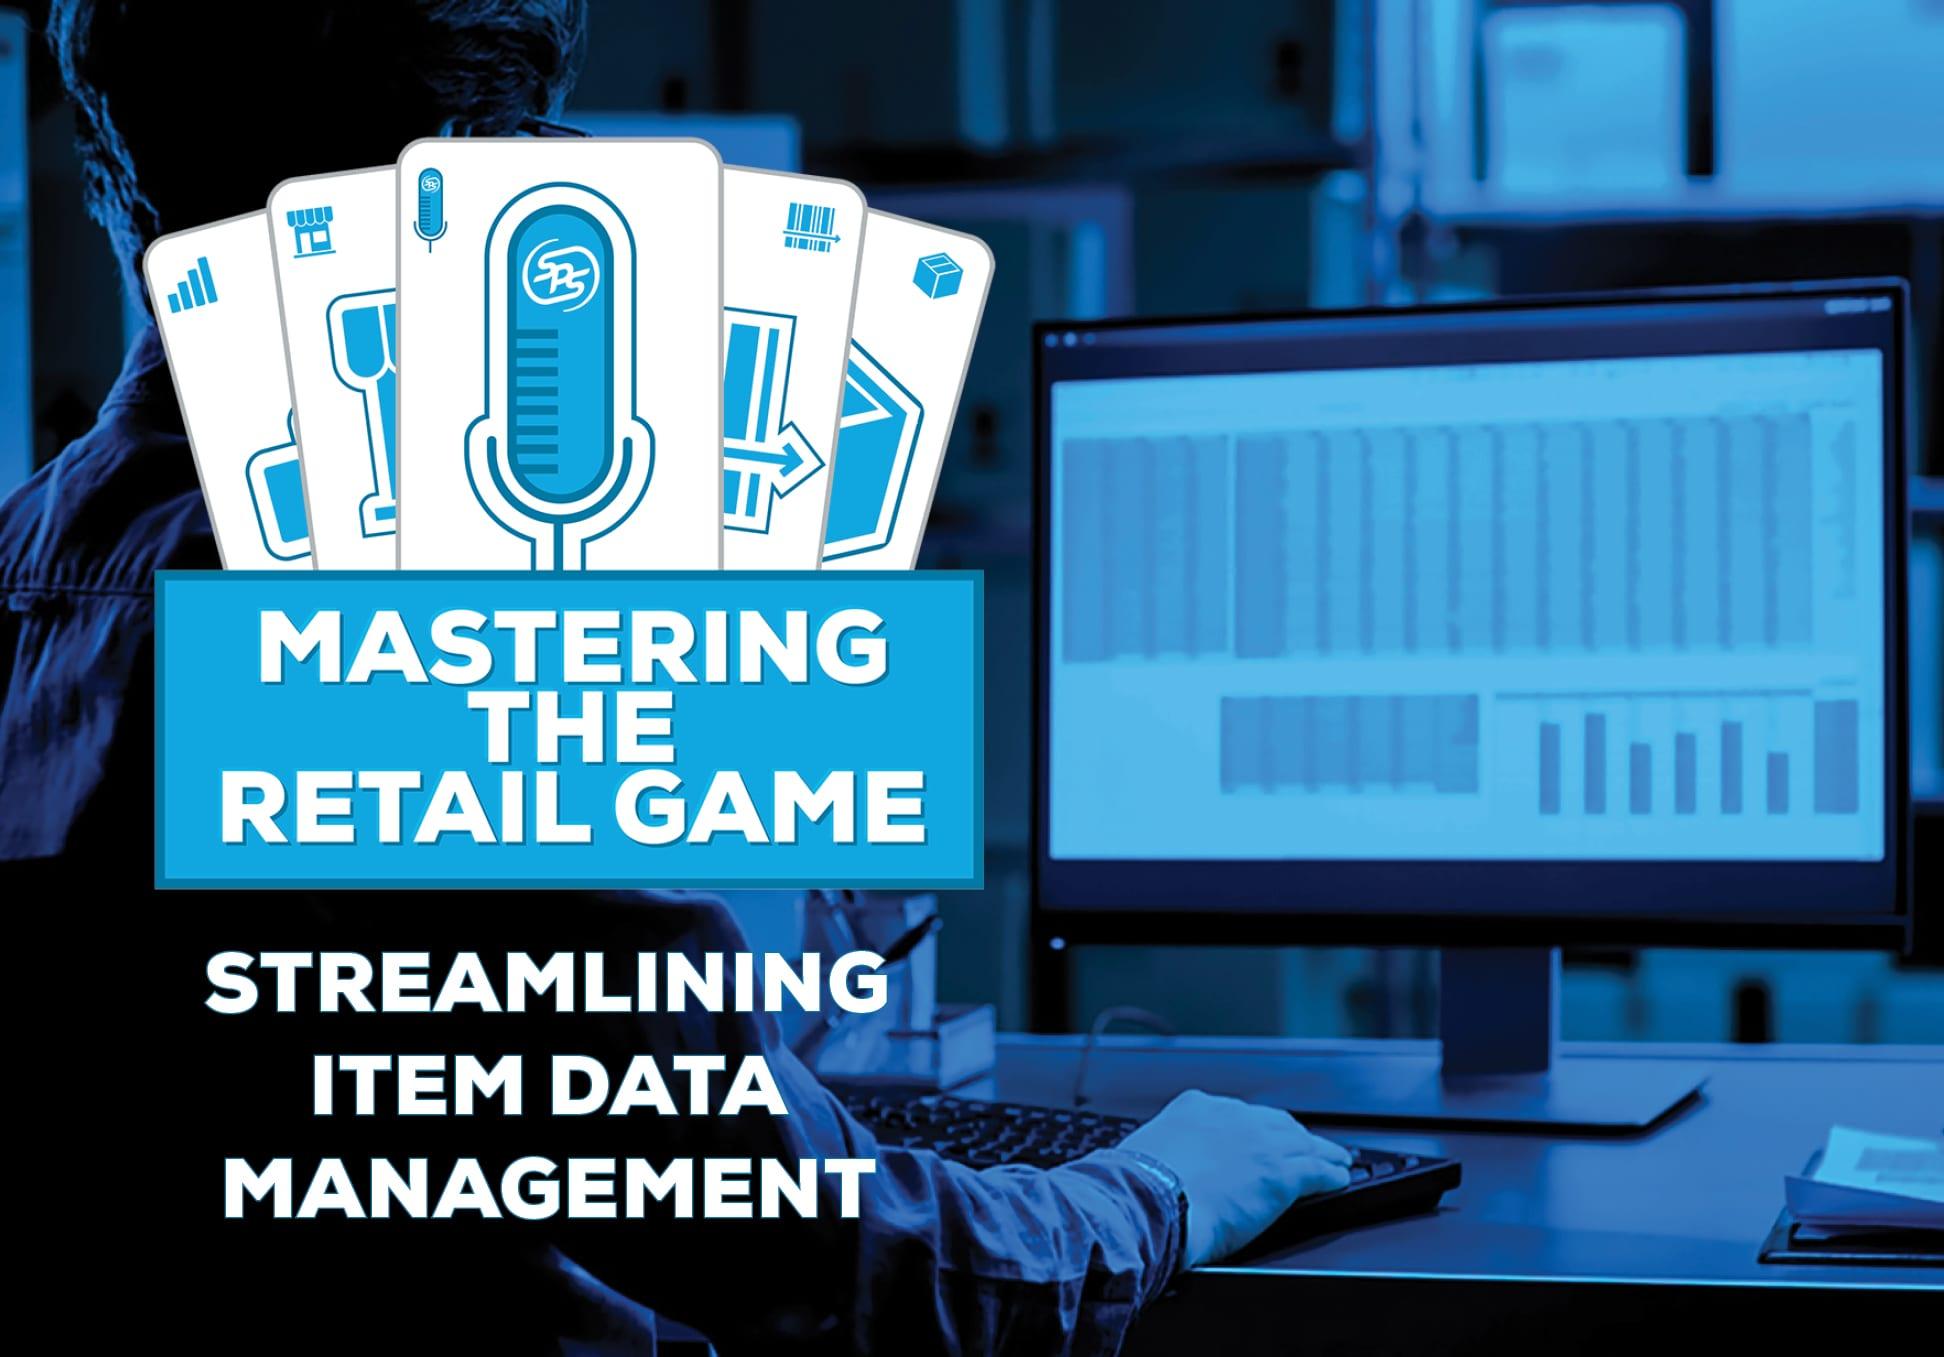 Streamlining Item Data Management - Mastering the Retail Game Podcast - Episode 5